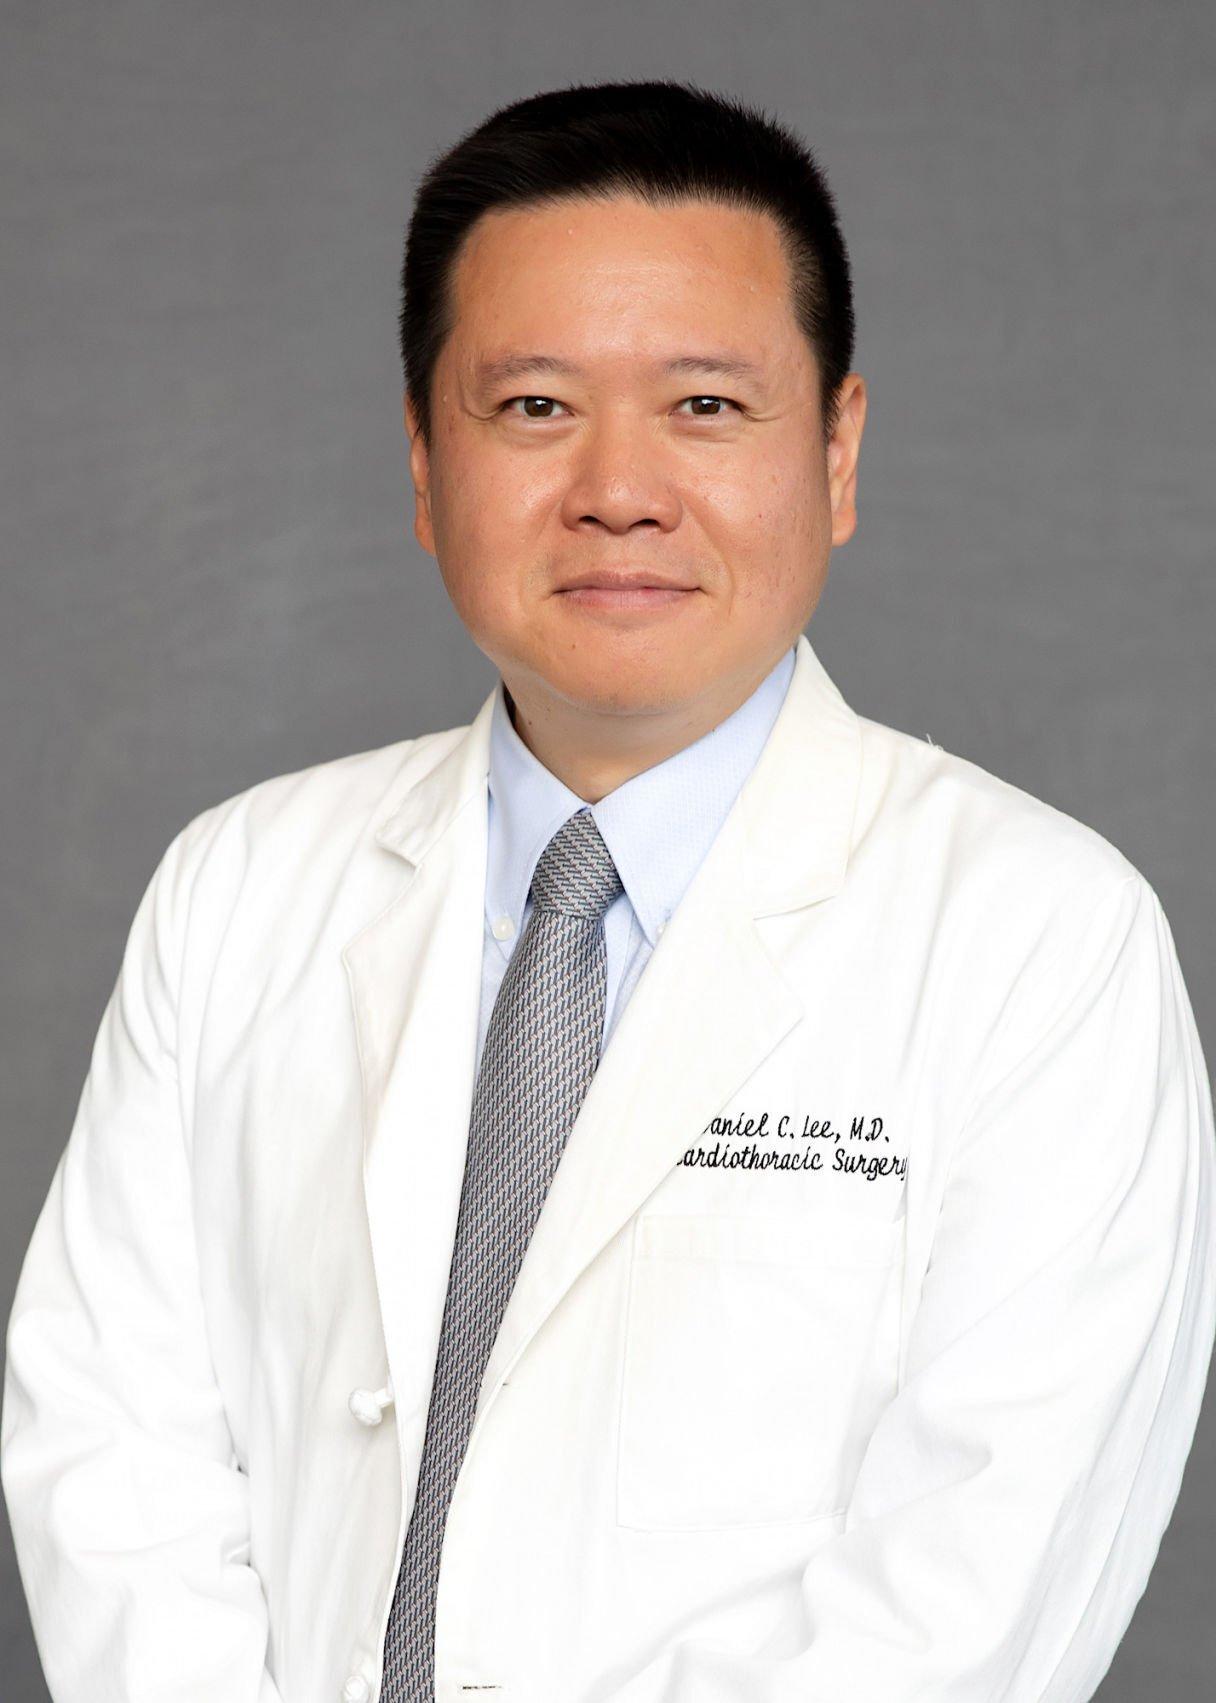 Chief of cardiac surgery at AAMC